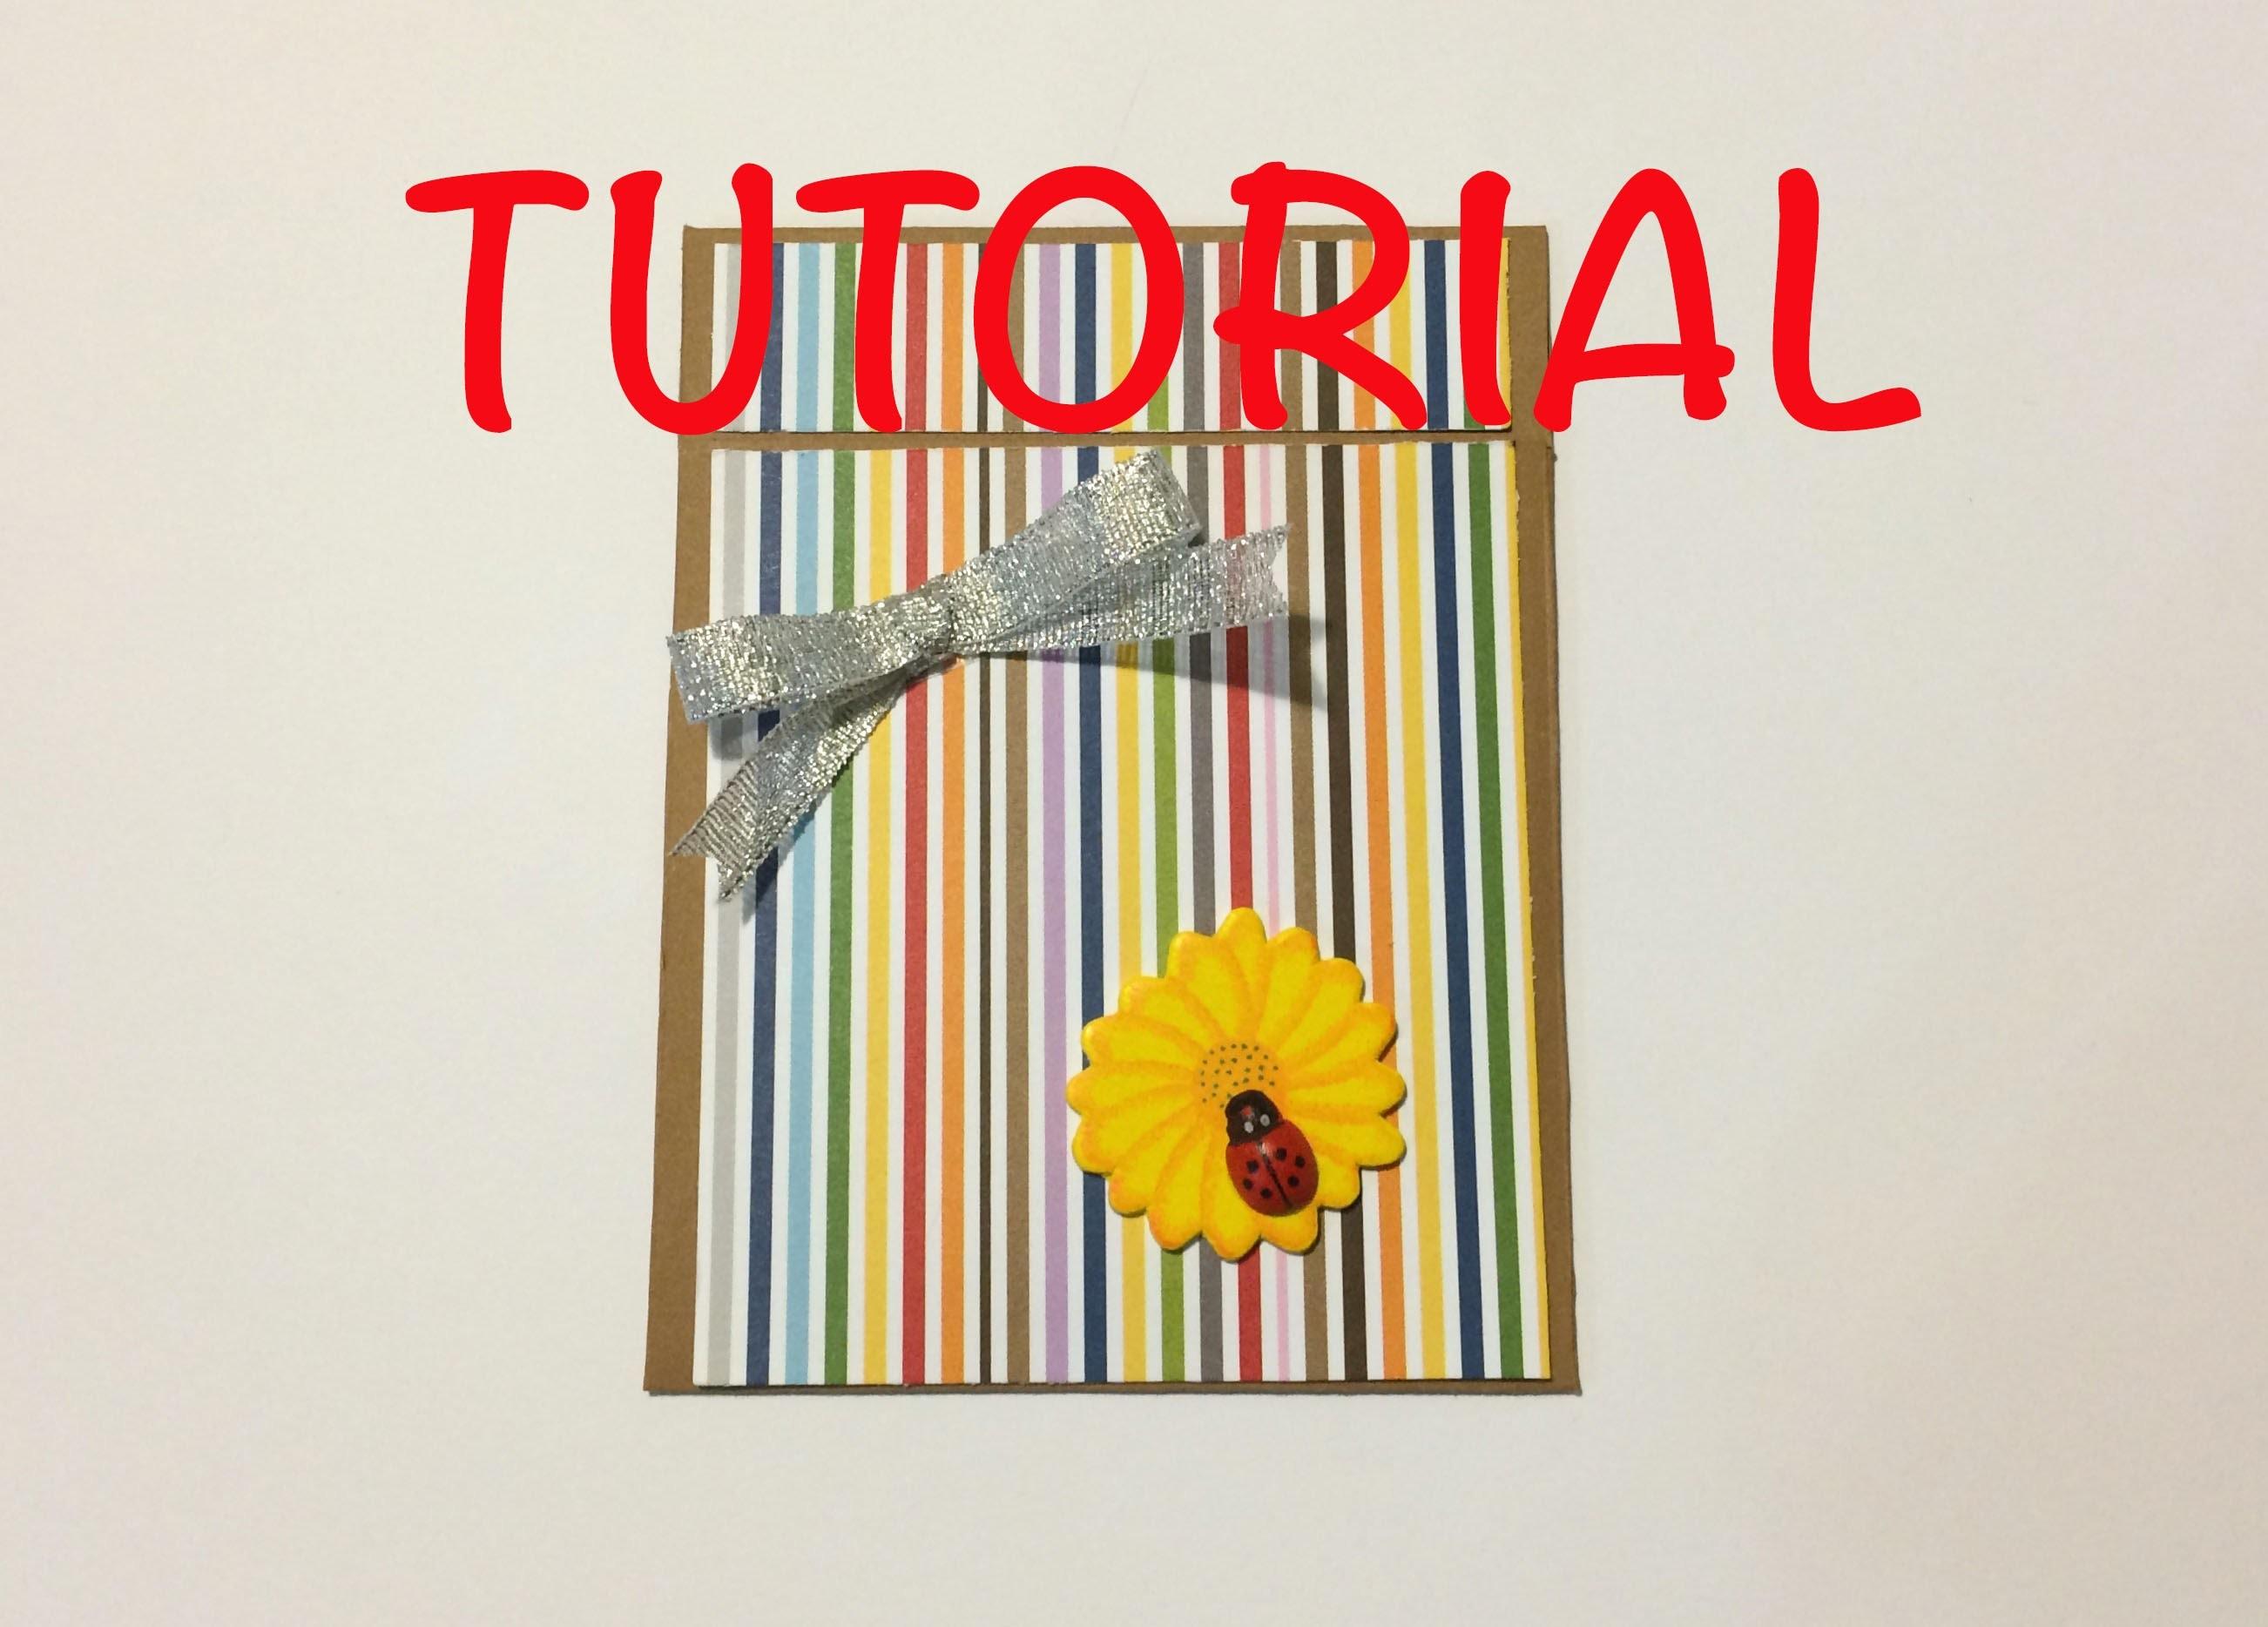 DIY Tutorial paso a paso tarjeta regalo deslizante slide card slide gift card